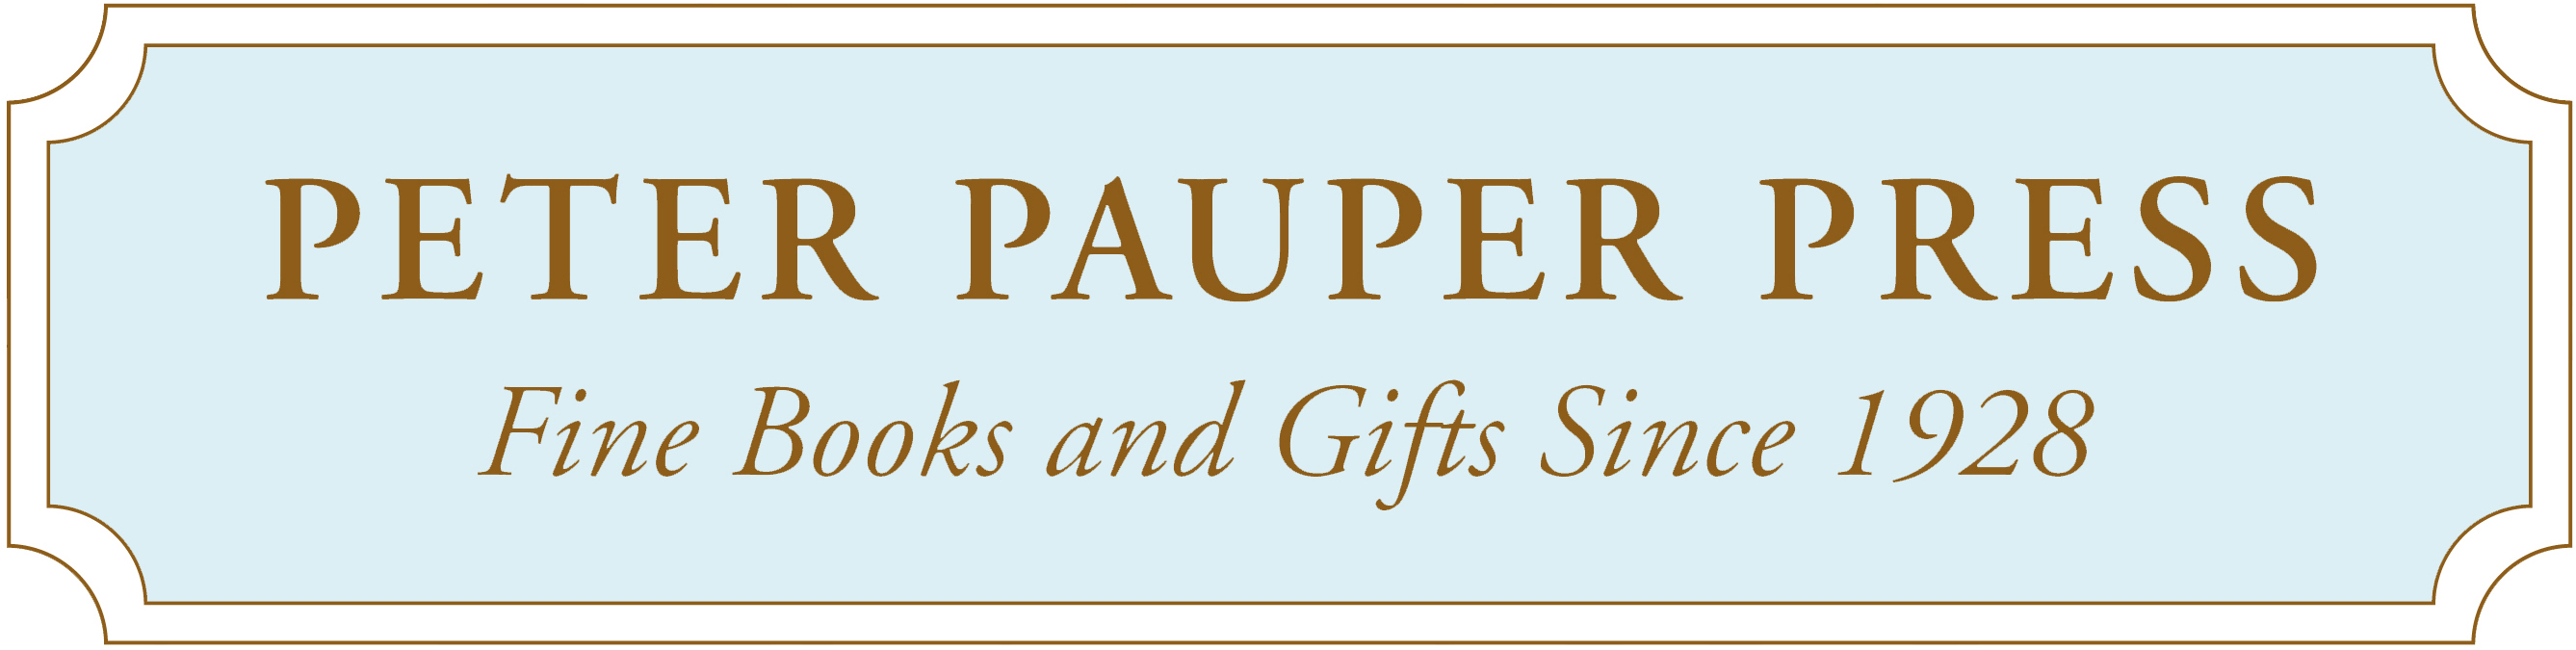 Home - Peter Pauper Press Inc